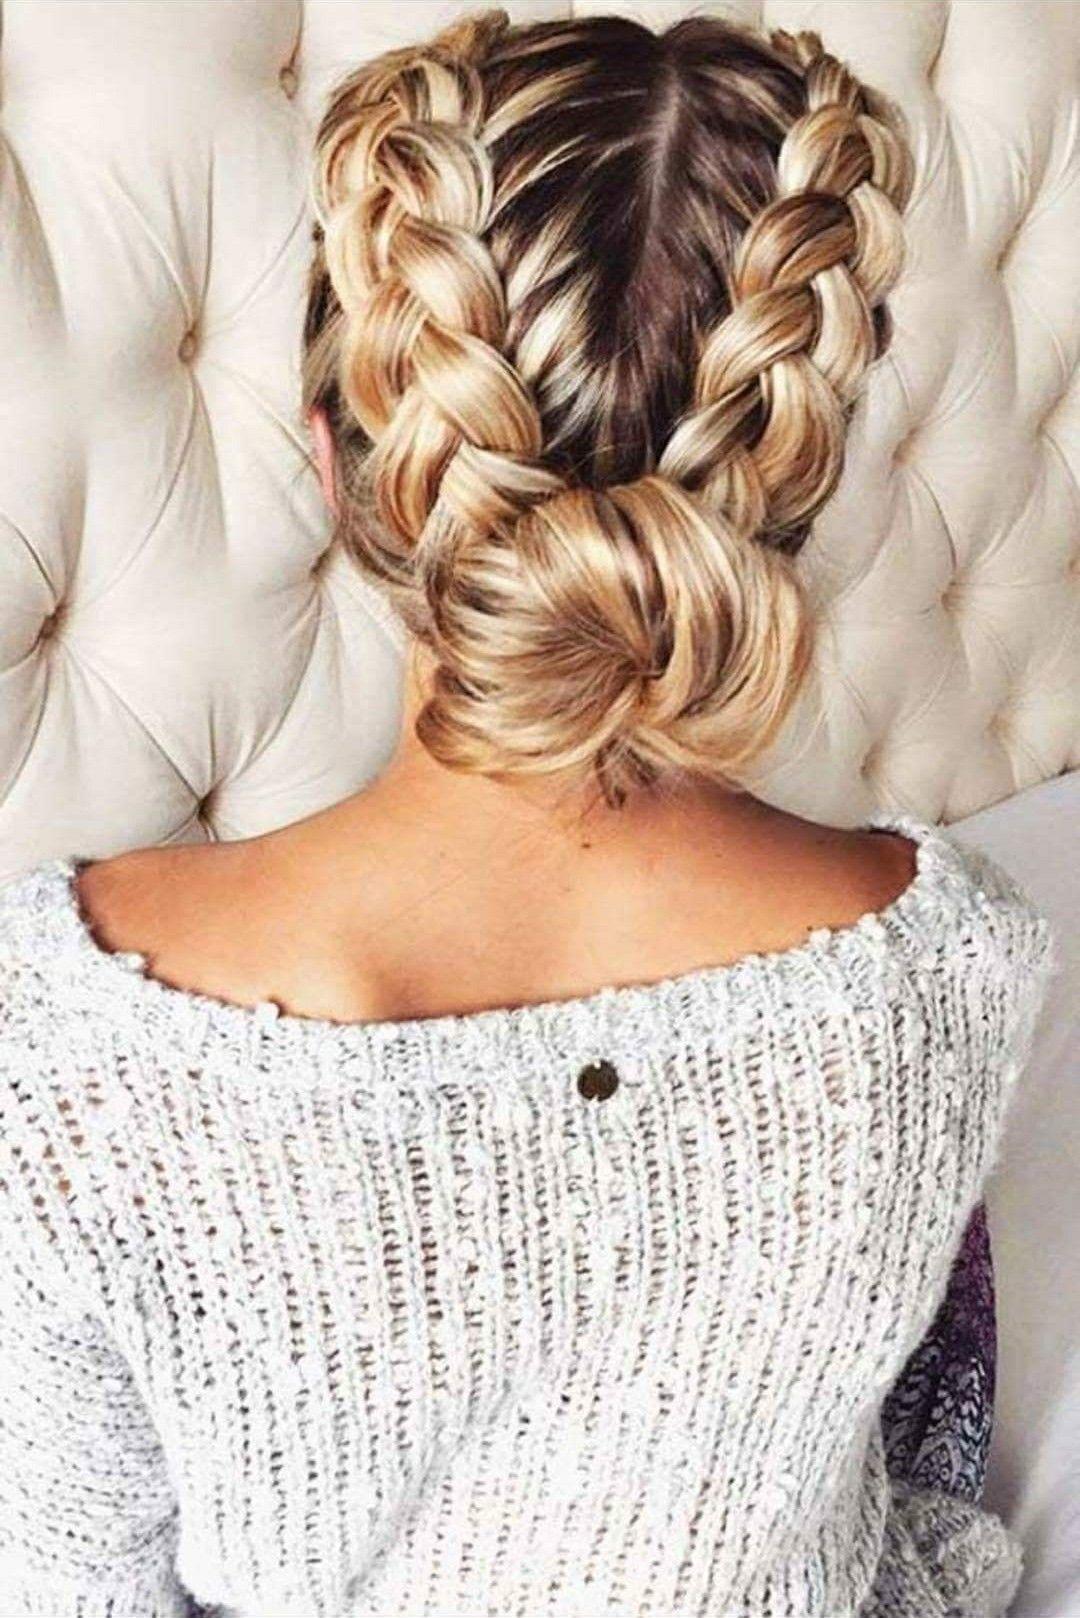 Double Dutch Braid Into Low Bun Hair Styles Long Hair Styles Hairstyle